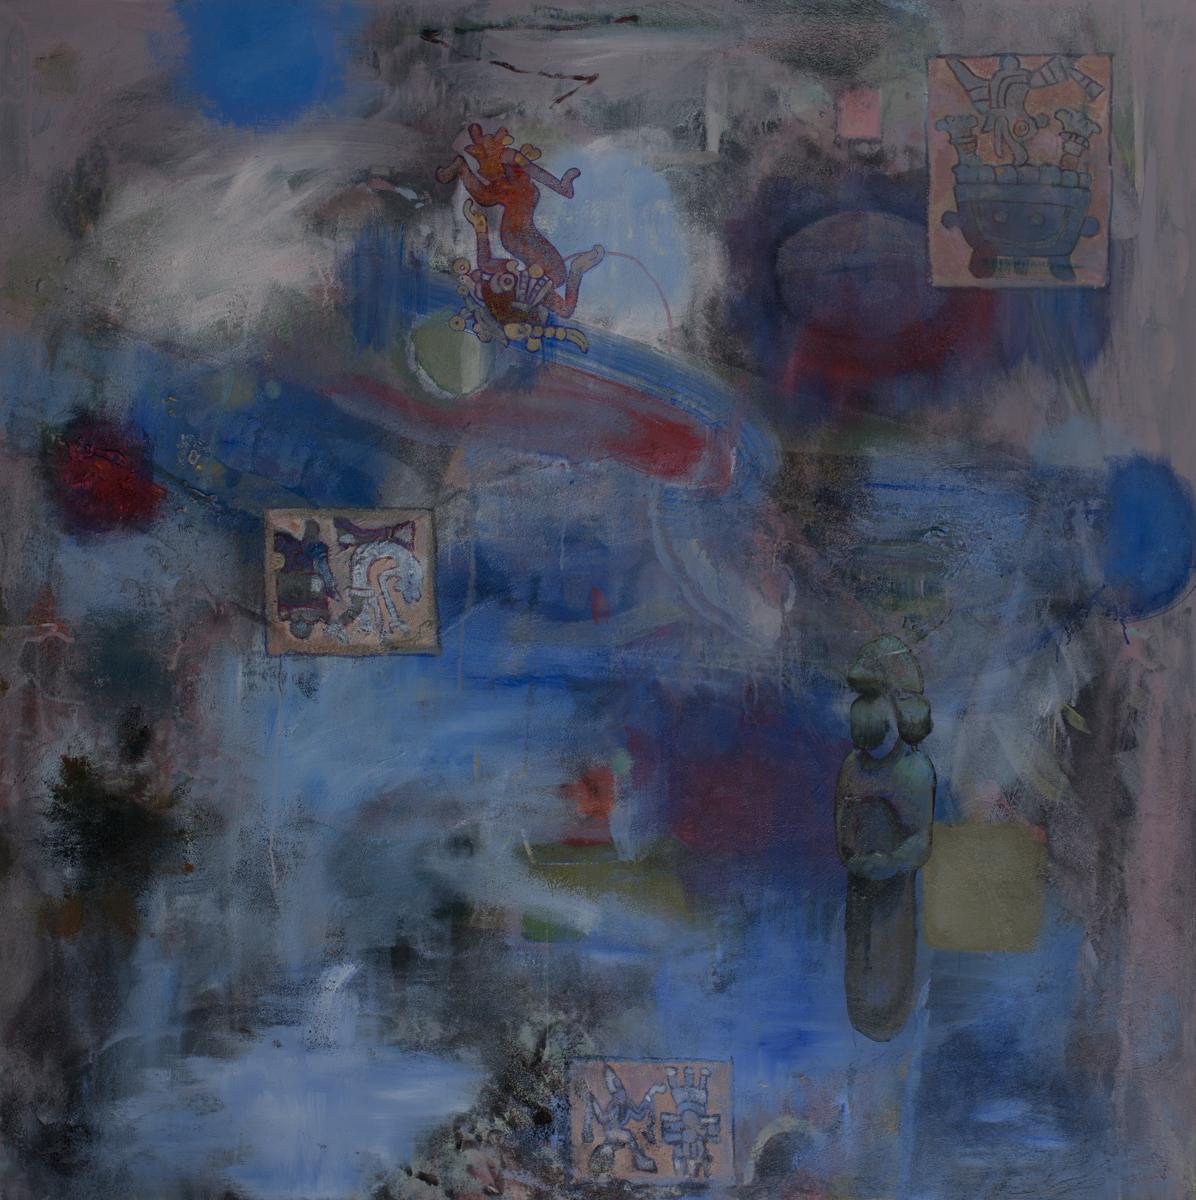 El Pozo    Acrylic pigments on Canvas  62 x 62 Inches  2019